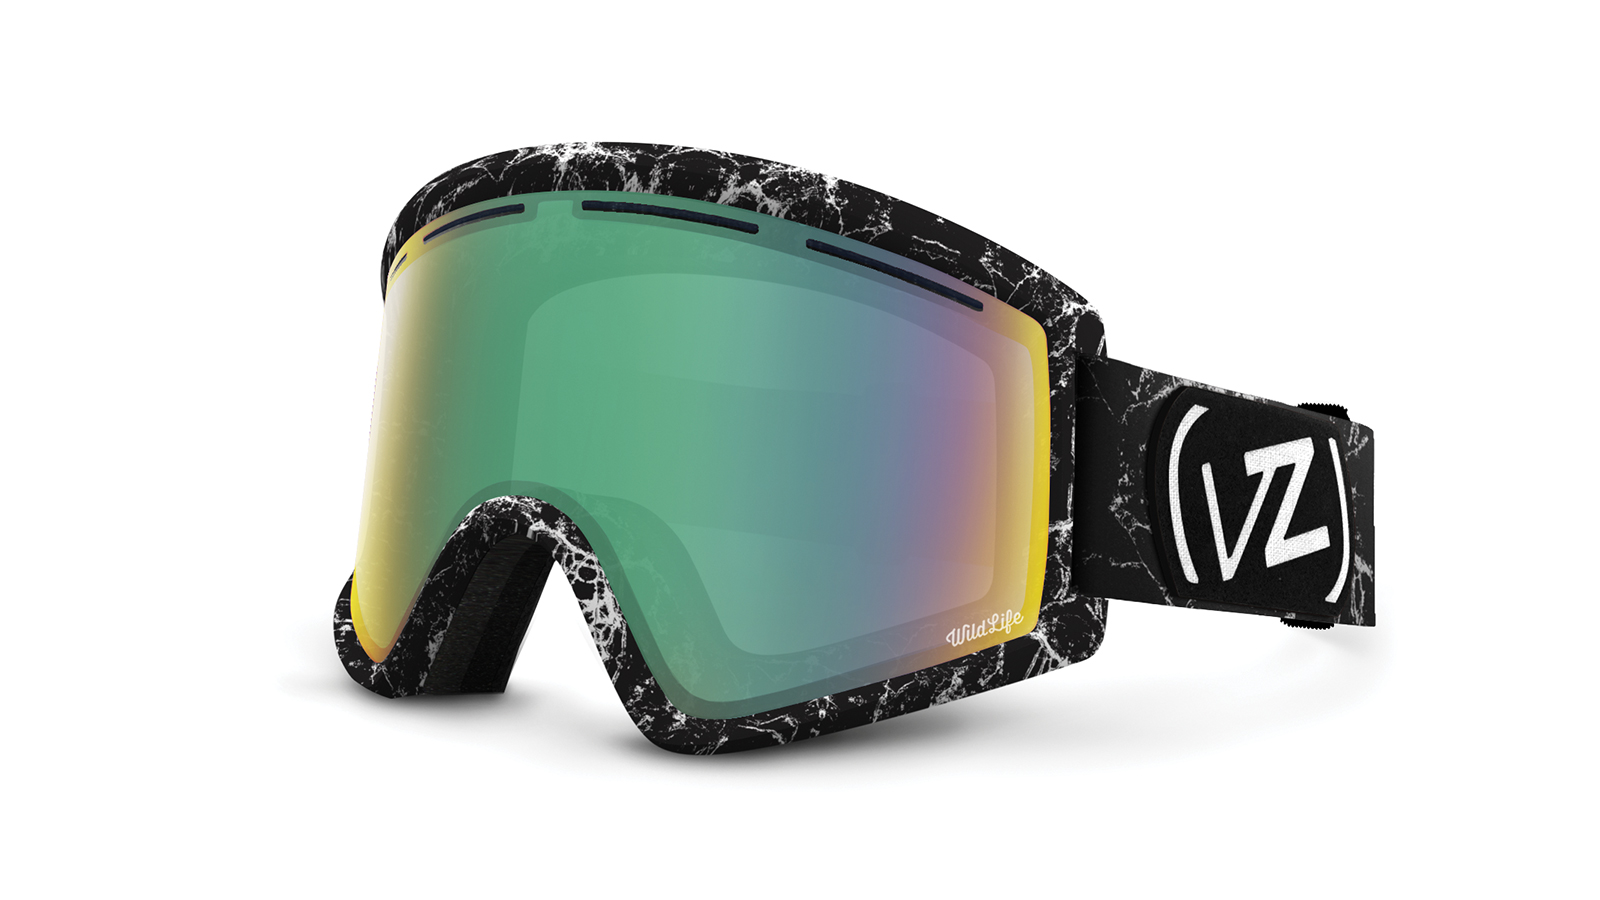 Von-Zipper-Cleaver-IT-Goggle